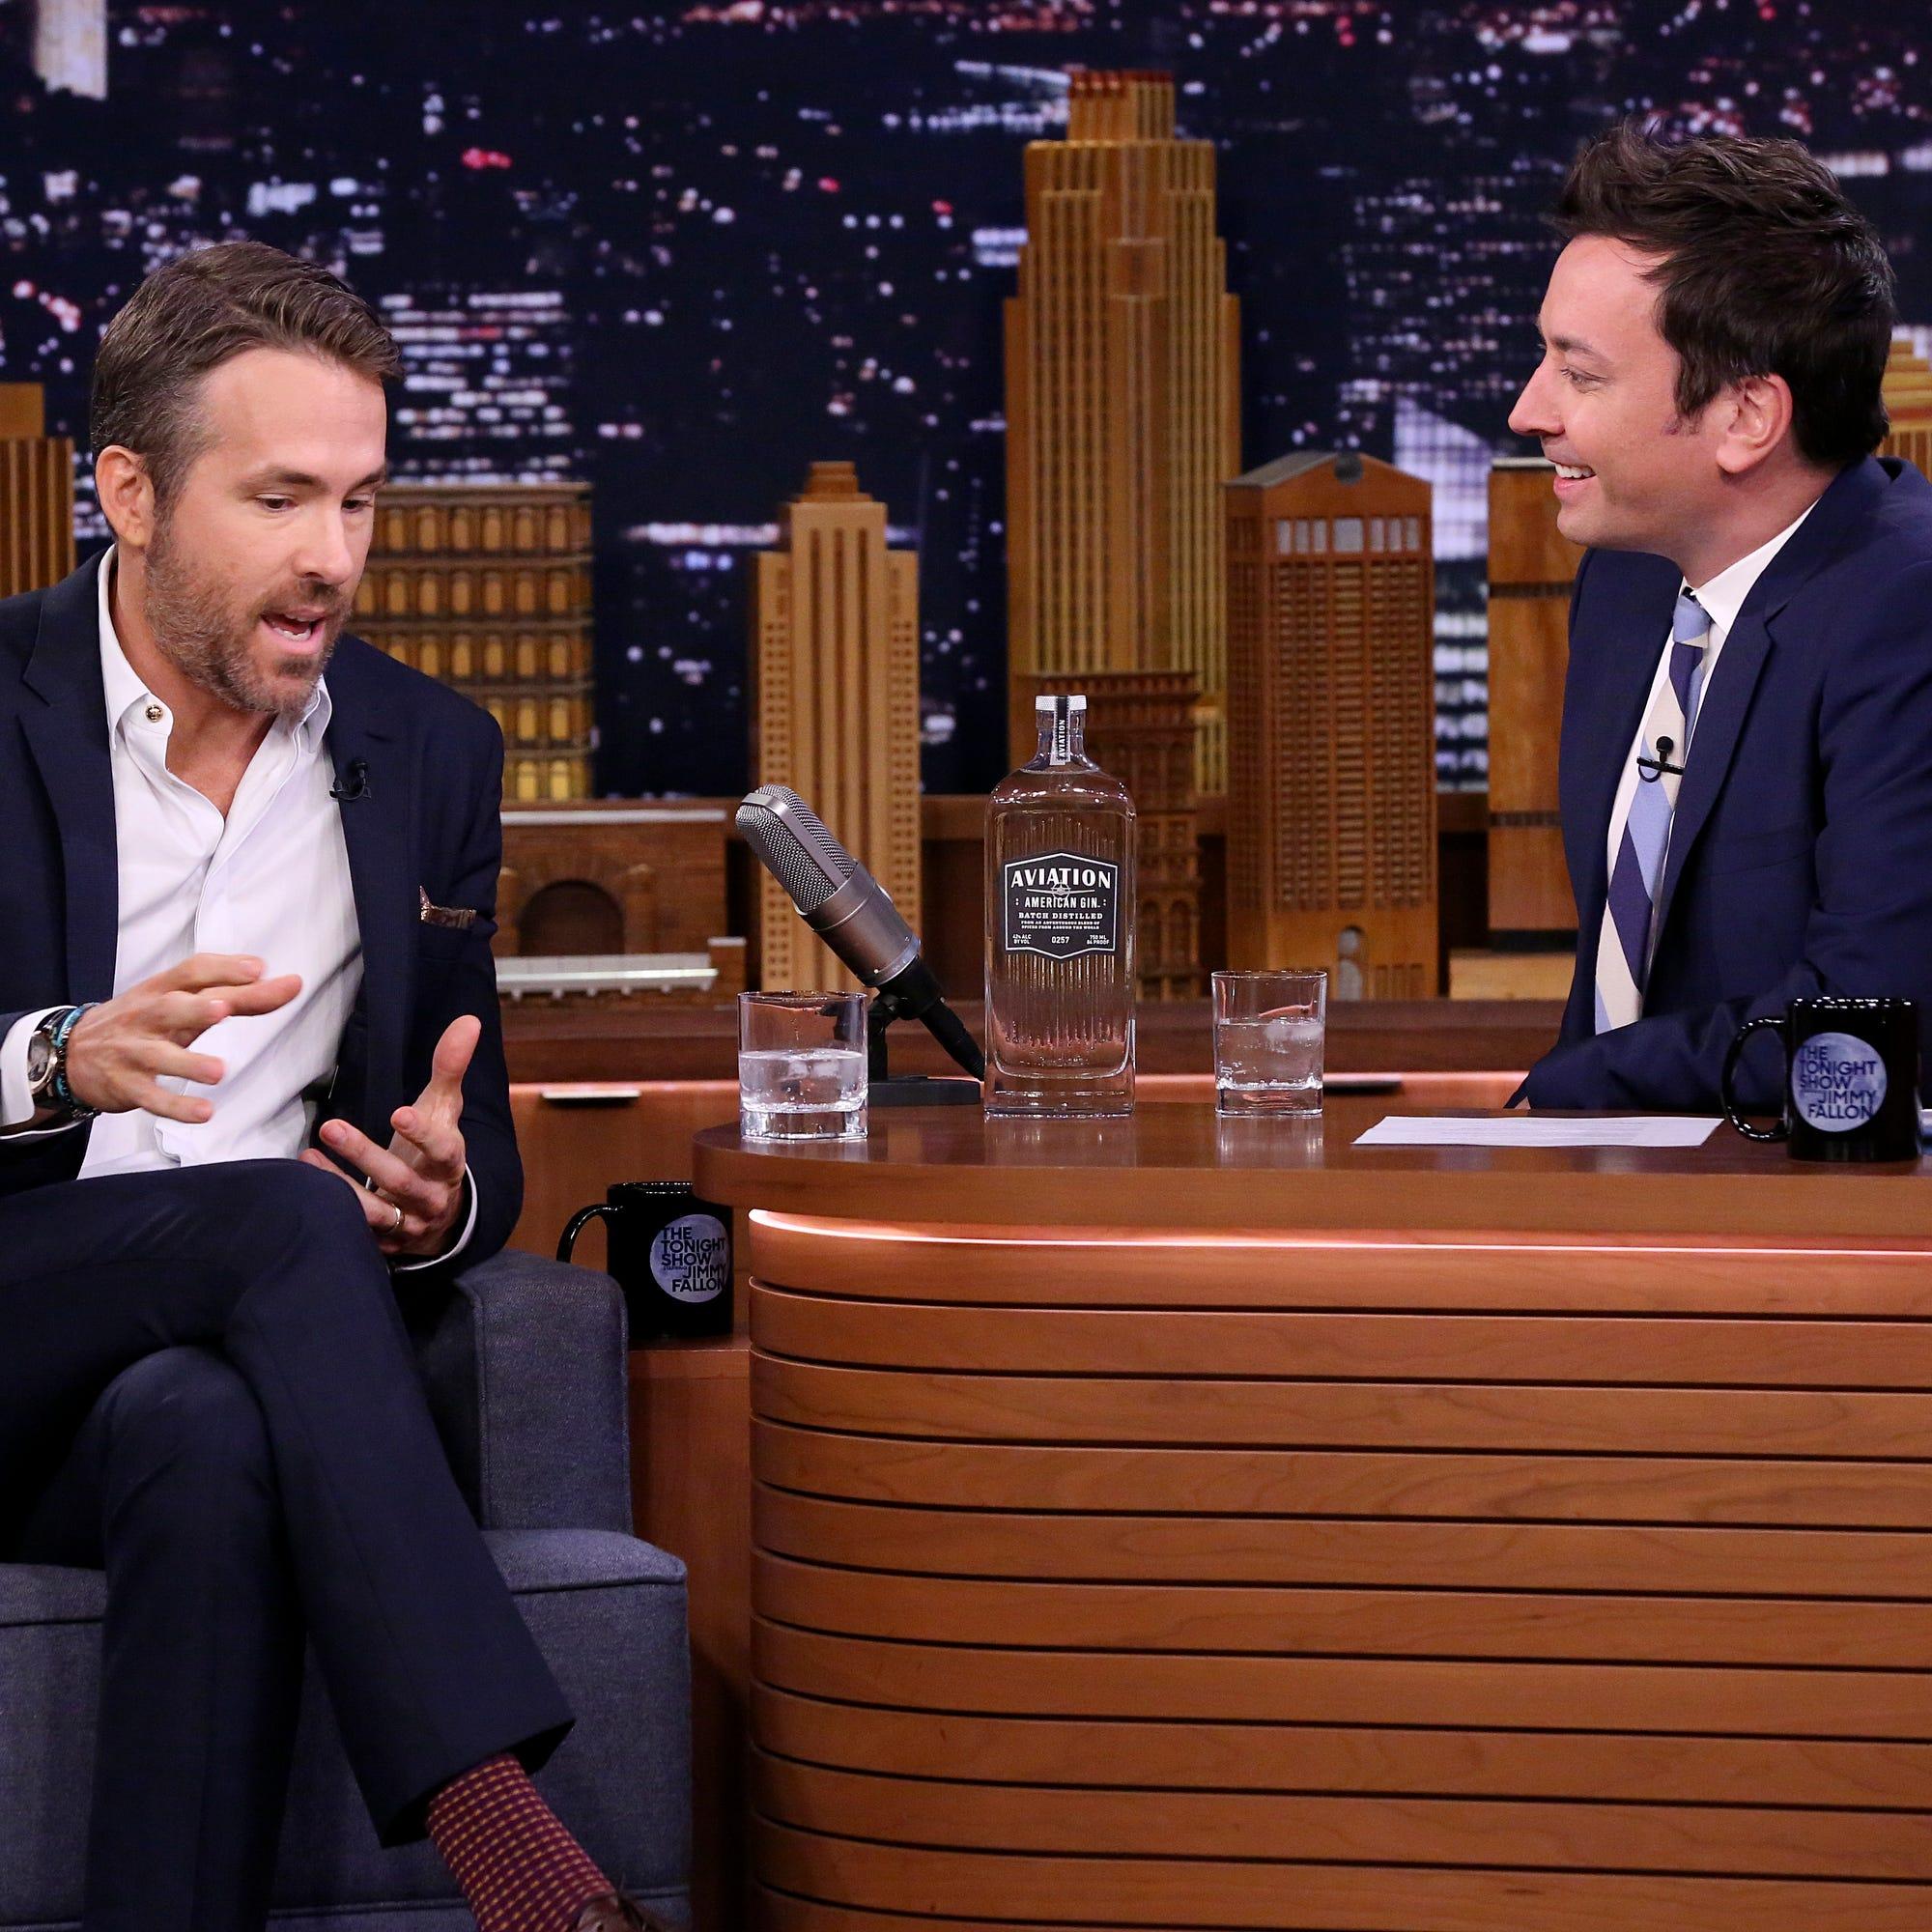 Cheers, Ryan Reynolds and Jimmy Fallon.